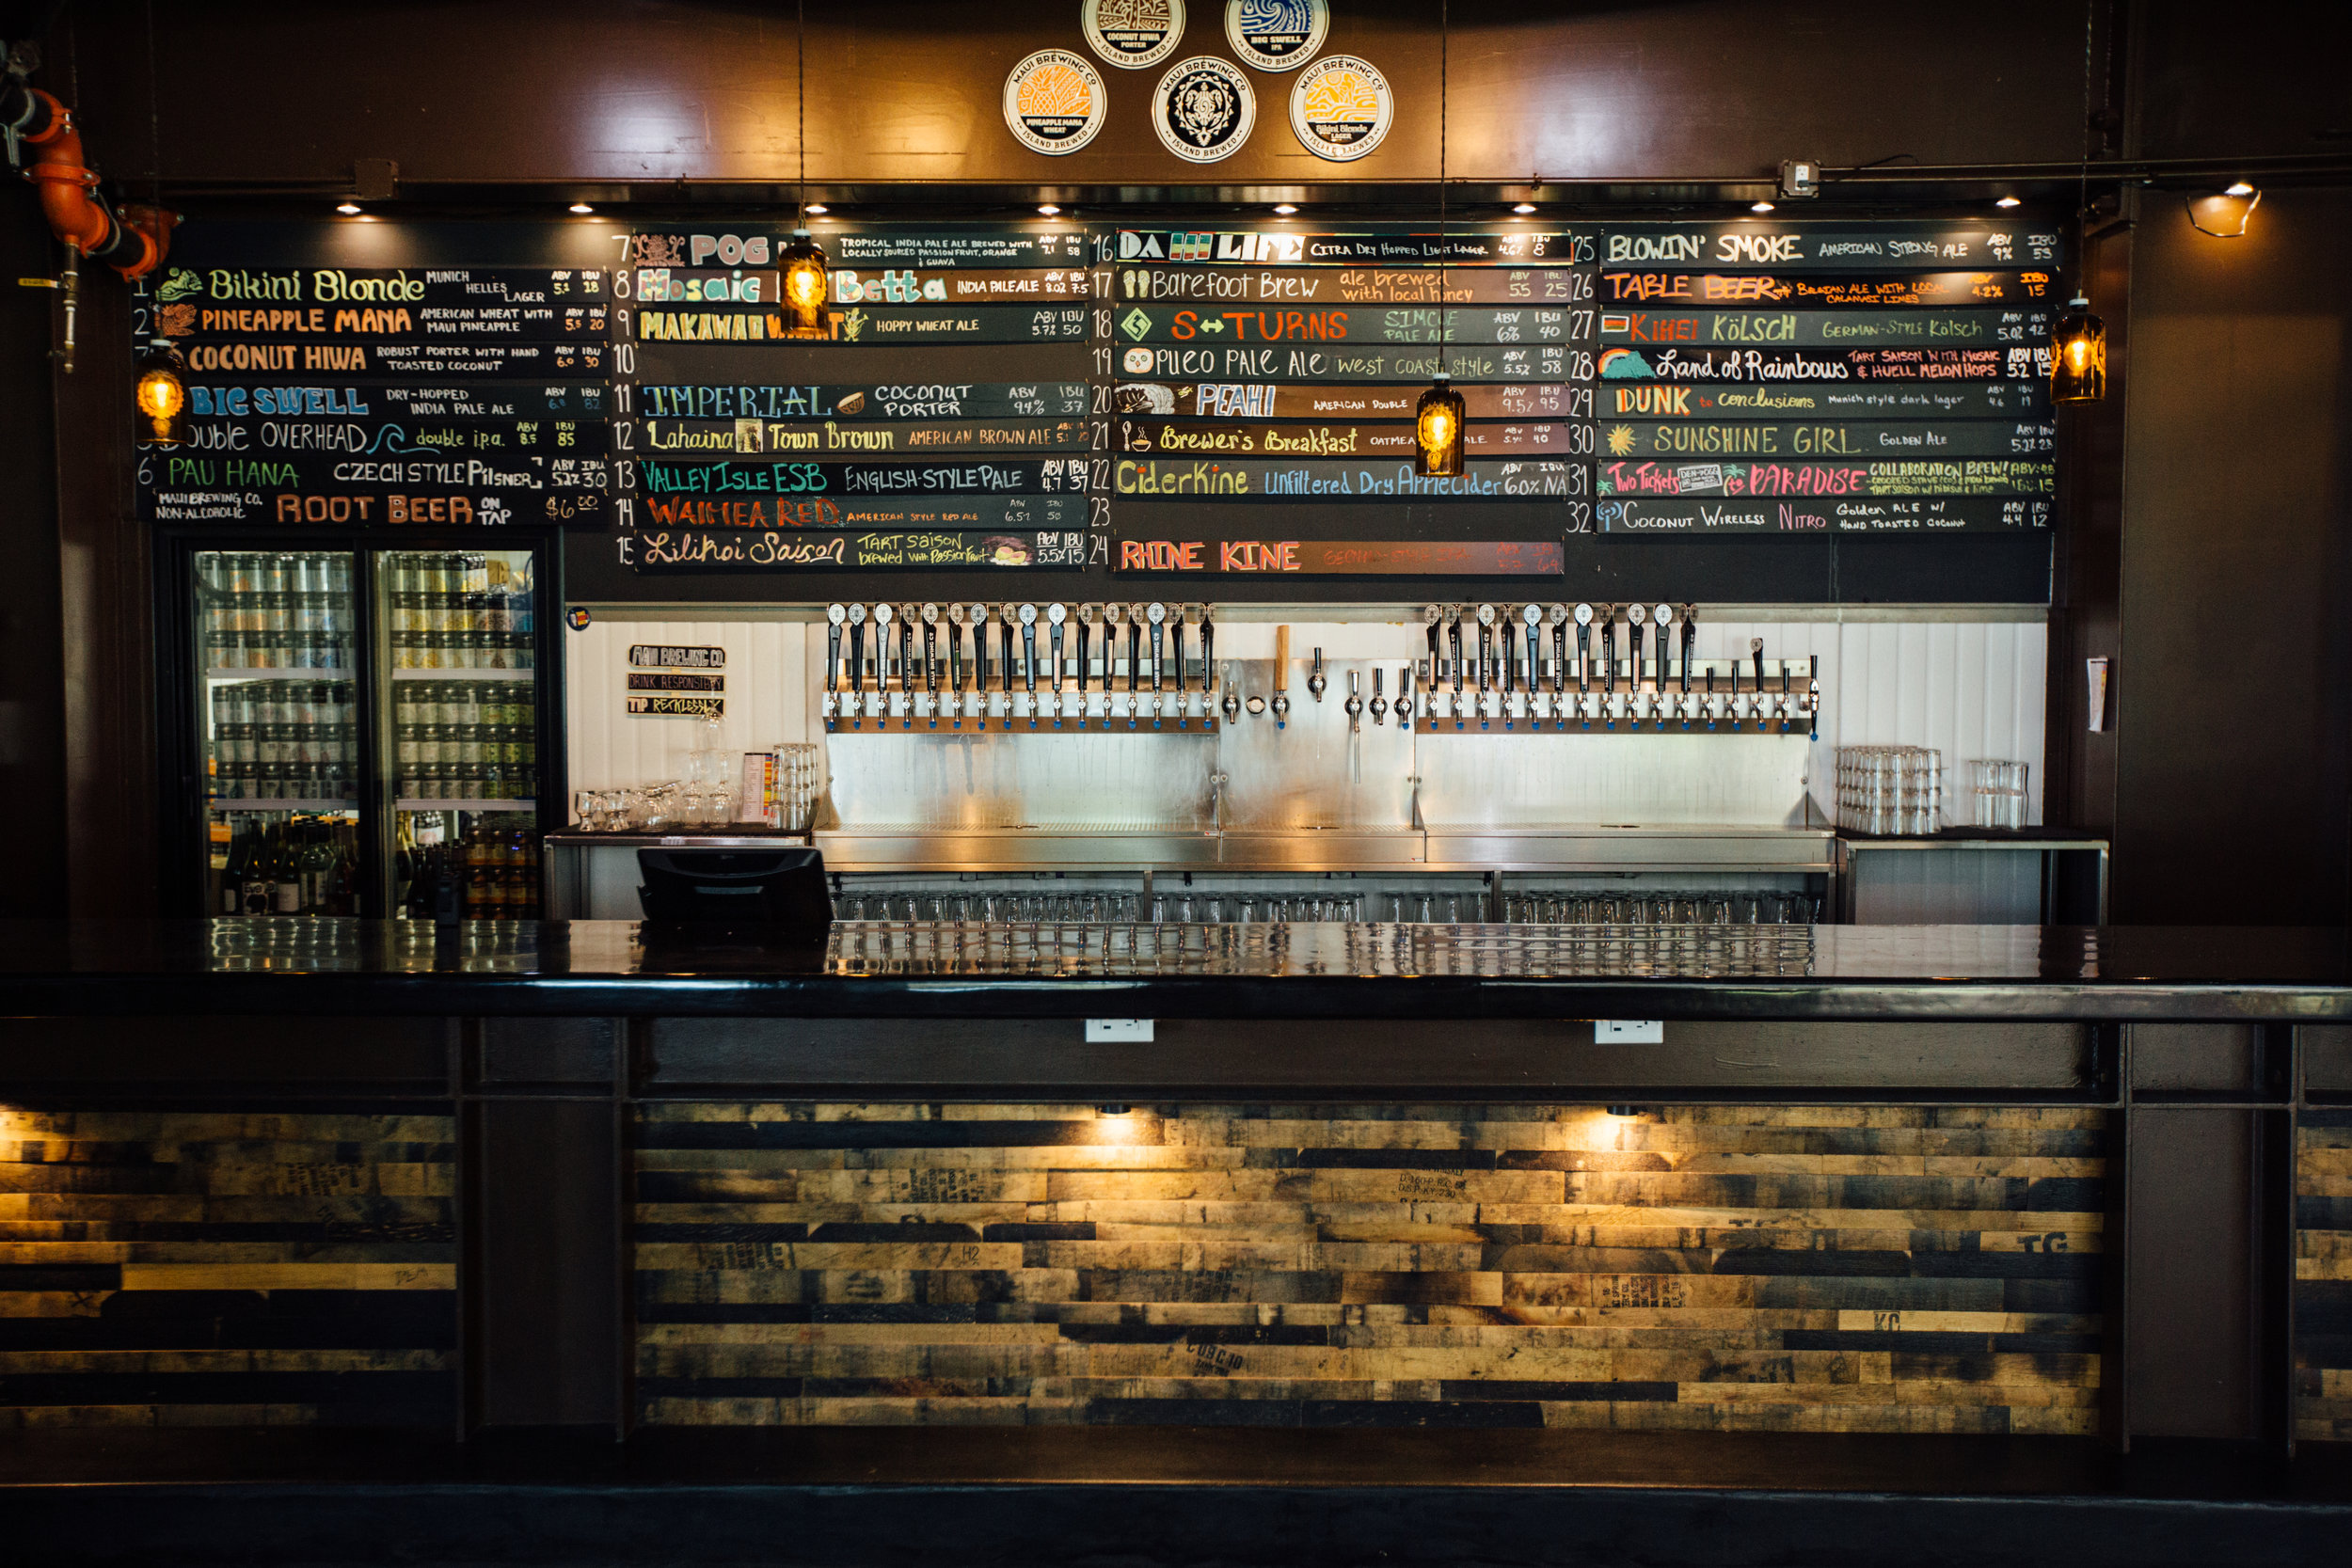 Maui Brewing's tasting room. Image via Maui Brewing